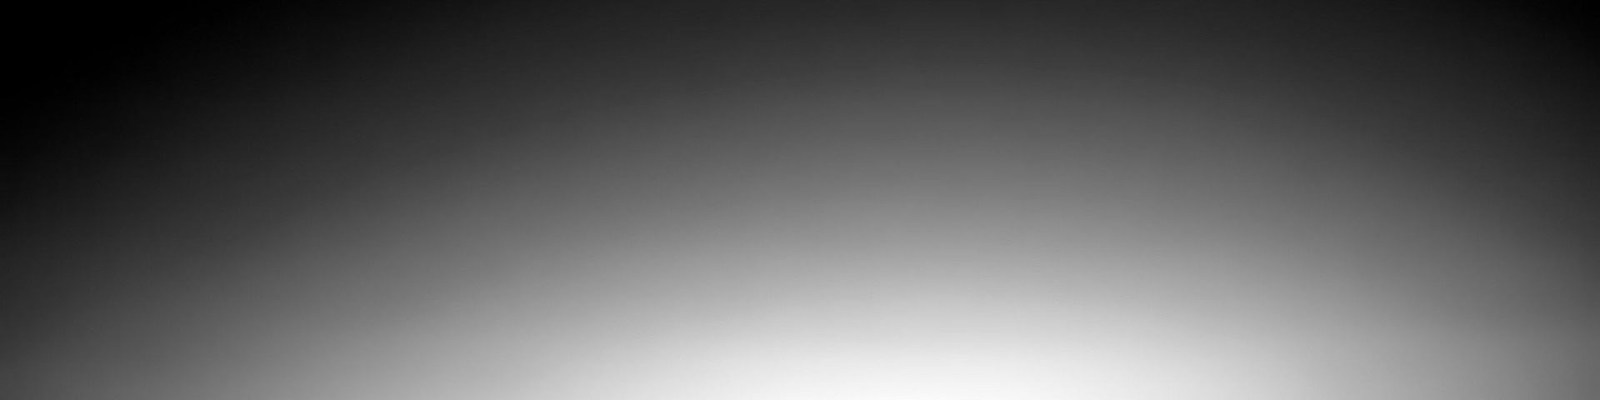 pengaruh dosa besar kepada manusia, umroh 2018, umroh 2017 Surabaya, Paket Umroh Murah Terbaik Surabaya, travel umroh terbaik surabaya, Info Umroh, Umroh Murah, Umroh murah Surabaya, Umroh 2018 Surabaya, Umroh Murah 2018 Surabaya, Paket Umroh Murah Surabaya, Travel Umroh Surabaya, Travel Umroh murah, Umroh Murah Surabaya, artikel umroh, info umroh murah, info umroh murah terbaru, info umroh murah 2018, info umroh 2018, info umroh Surabaya, biaya paket umroh murah Surabaya, harga umroh 2017 Surabaya, harga umroh 2018 Surabaya, Umroh Murah terbaik Surabaya, paket umroh 2017 Surabaya, paket umroh murah 2018 Surabaya, paket umroh 2018 Surabaya, umroh 2017, umroh gratis Surabaya, umroh cerdas, umroh november 2017 Surabaya, umroh desember 2017 Surabaya, umroh murah 2018 Surabaya, umroh plus turki, umroh langsung madinah, promo umroh murah 2018 Surabaya, info umroh 2017 Surabaya, info umroh gratis, info umroh terbaru Surabaya, info umroh kemenag, umroh 2019 surabaya, urmoh murah 2019 surabaya, paket umroh 2019 surabaya, travel umroh murah 2019 surabaya, harga umroh 2019 surabaya, promo paket umroh umroh 2019 Surabaya, harga umroh 2019 Surabaya, paket umroh murah hemat Surabaya, paket umroh murah ekonomi Surabaya, paket umroh murah bisnis Surabaya, paket umroh murah vip Surabaya